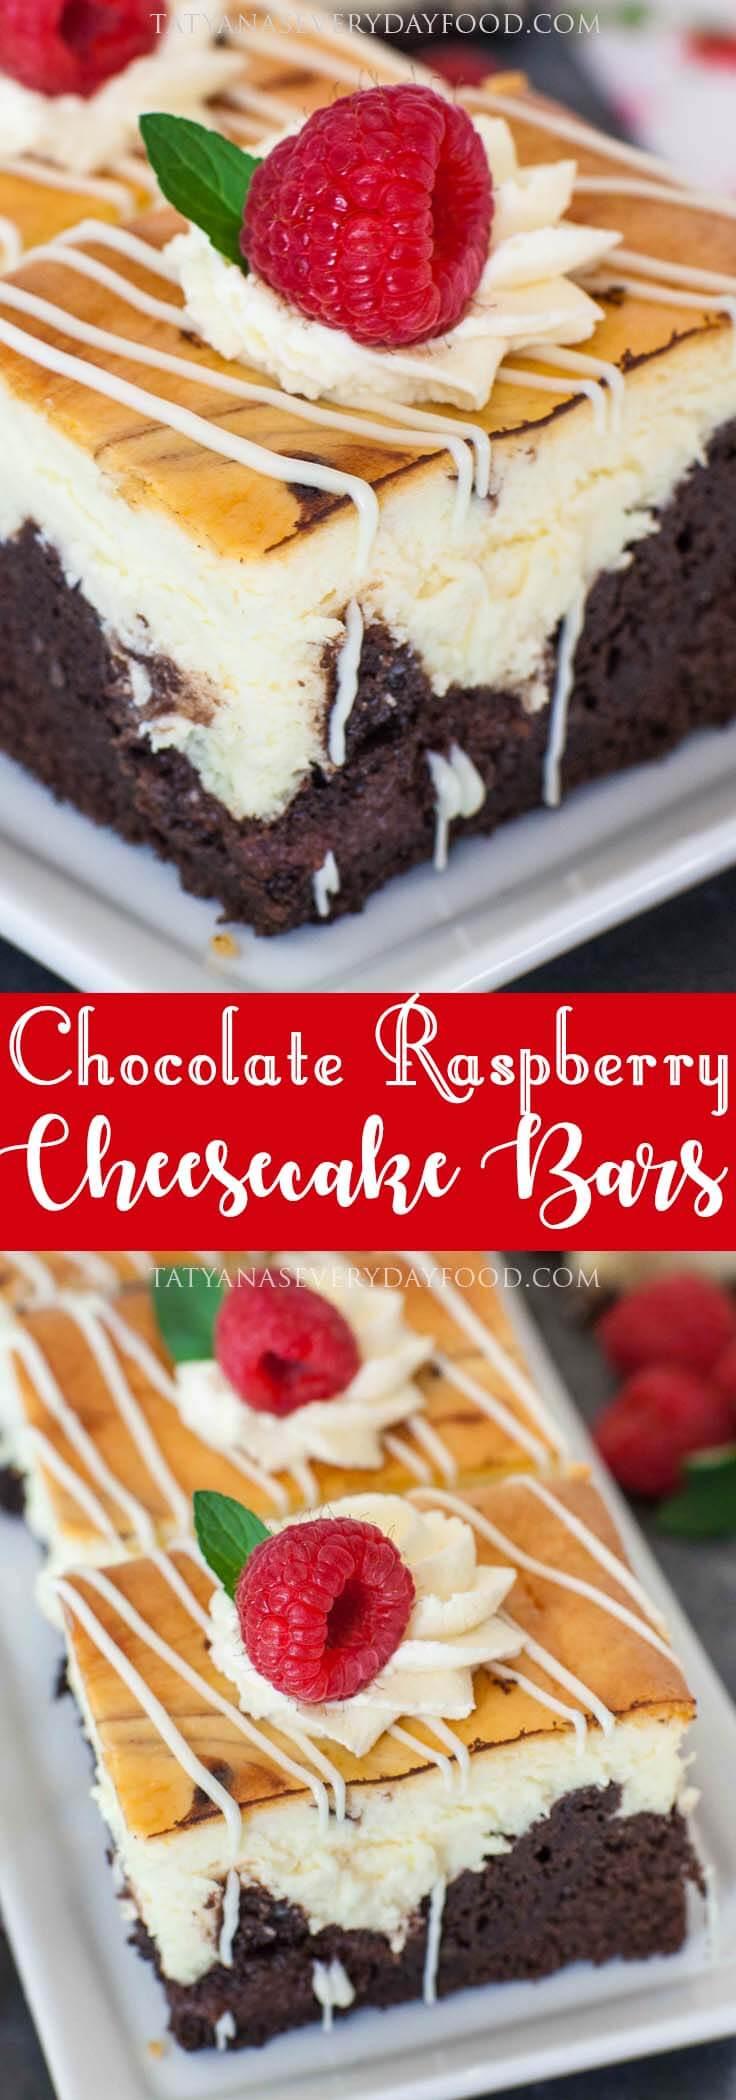 Chocolate Raspberry Cheesecake Bars with video recipe